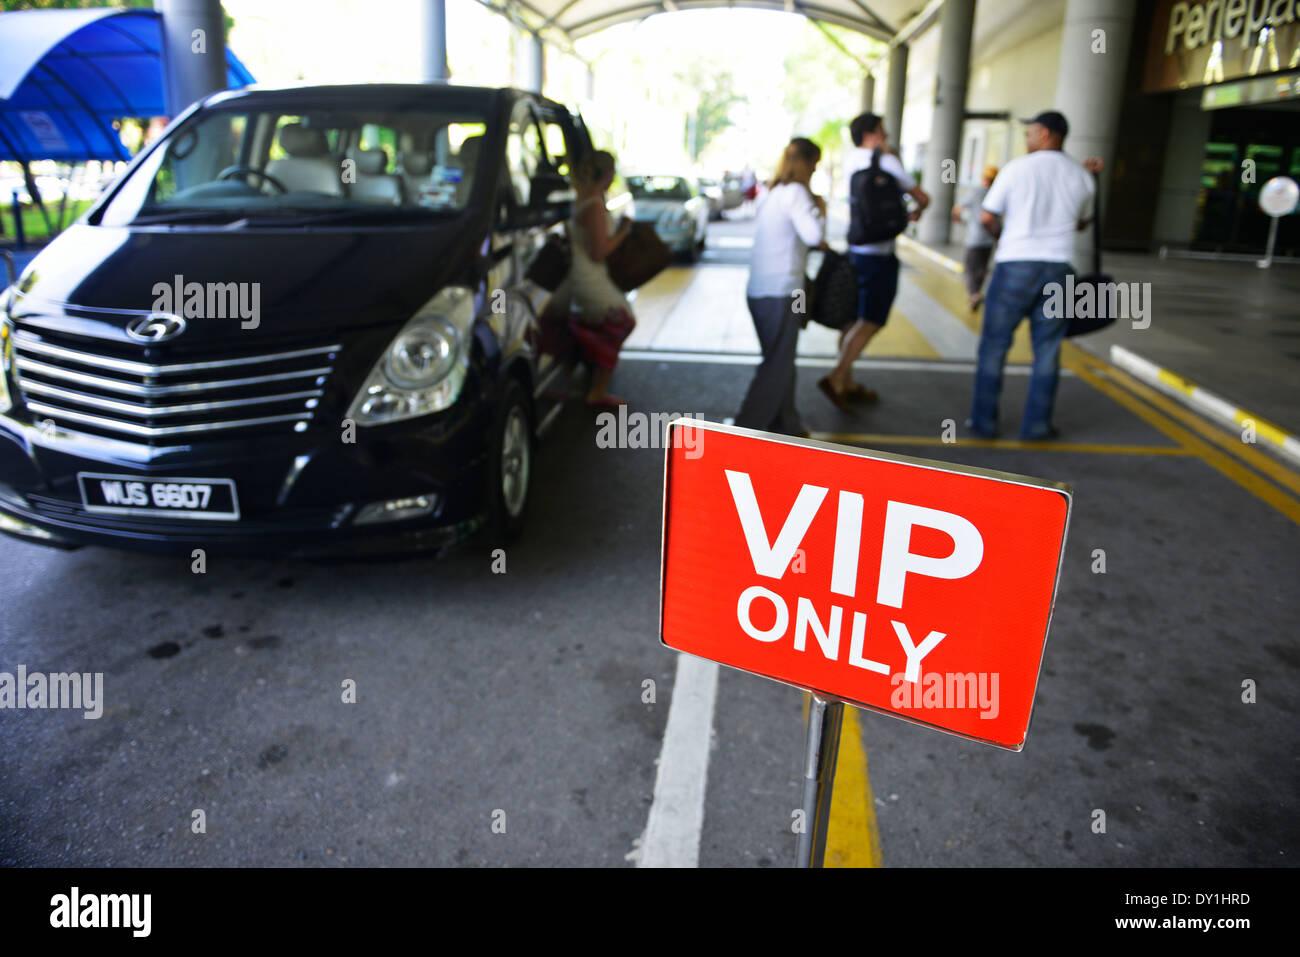 VIP hotel parking - Stock Image